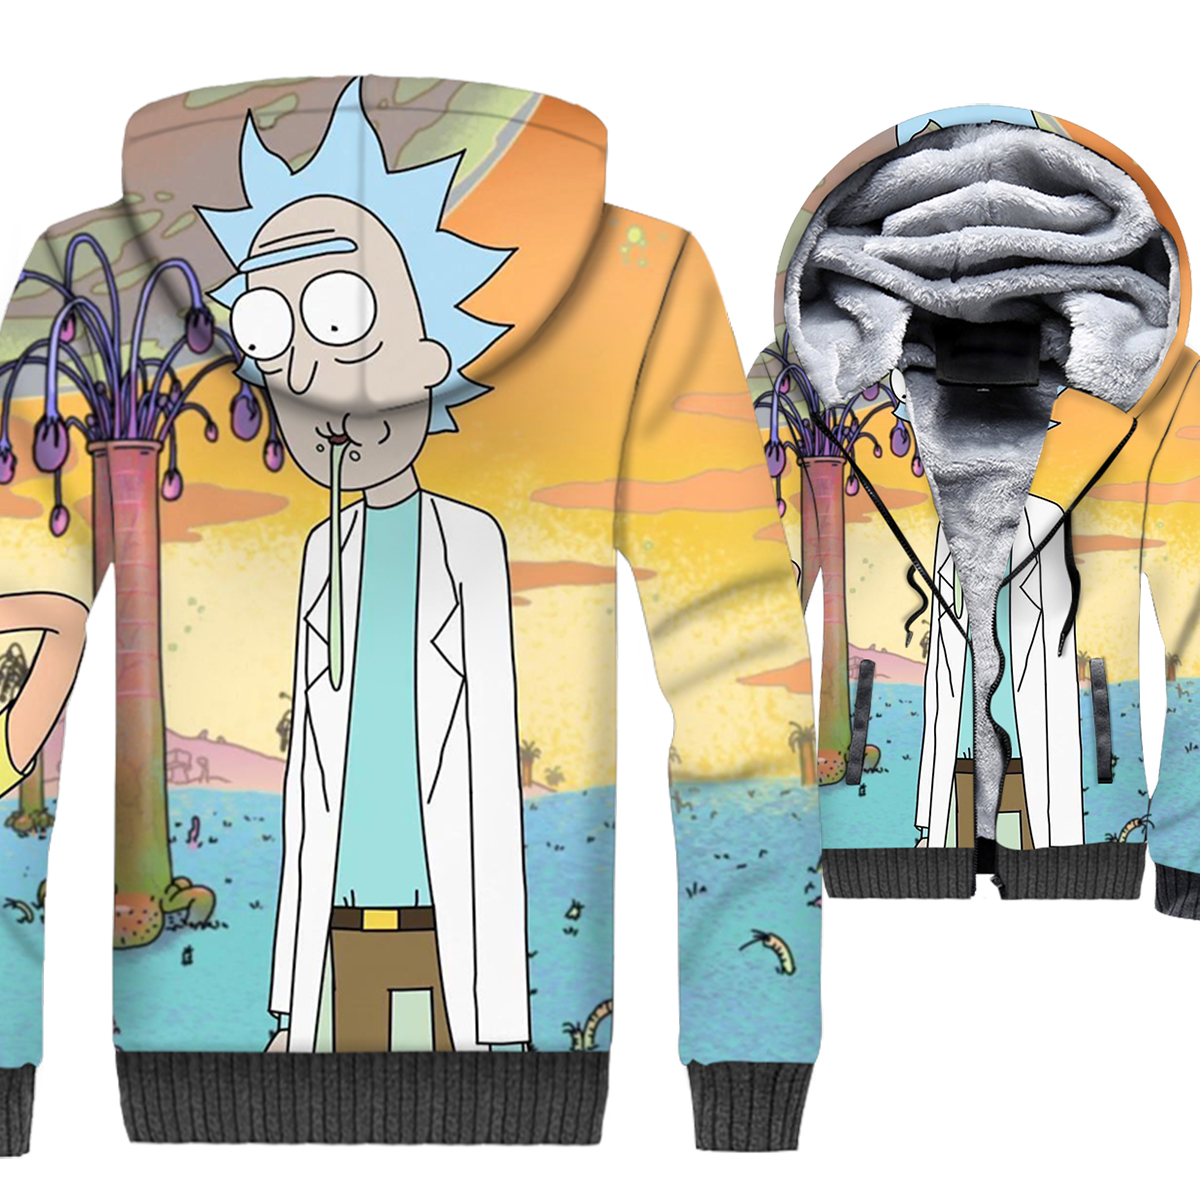 2018 New Arrival Men 39 s Sweatshirts For Autumn Winter Fleece Coats RICK AND MORTY 3D Printed Clothing Hip Hop Hoodies For Men Top in Hoodies amp Sweatshirts from Men 39 s Clothing